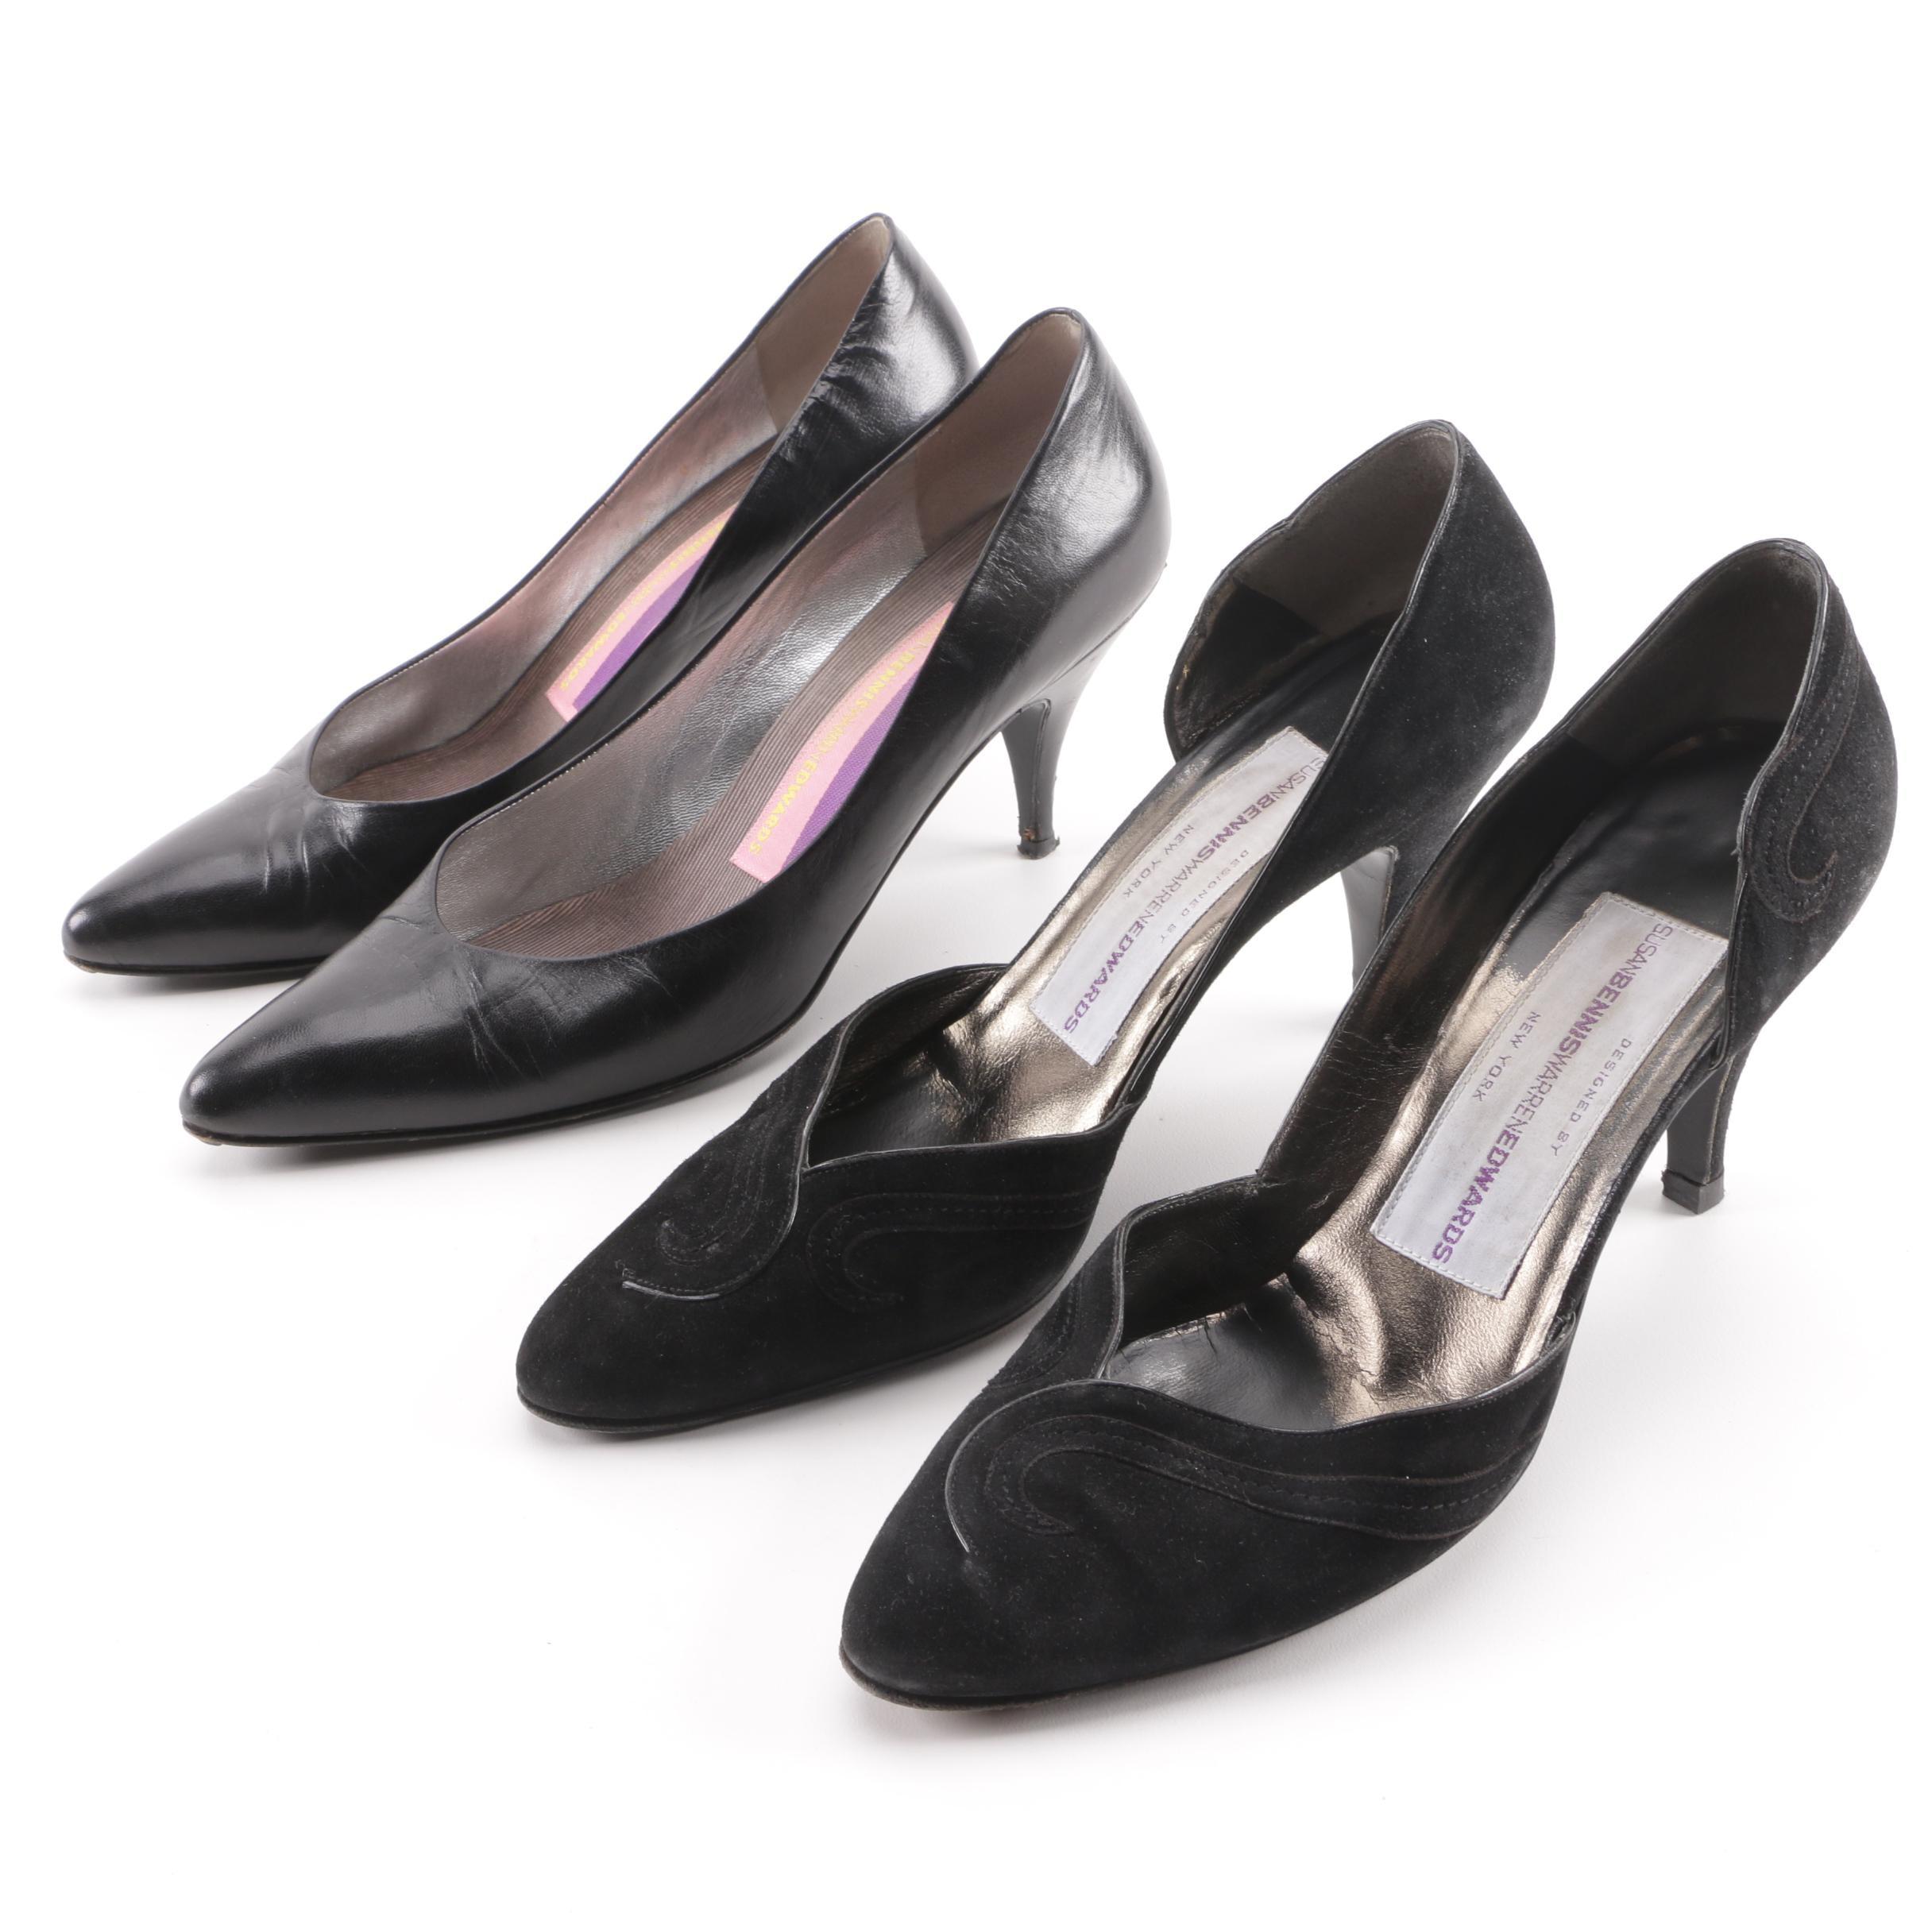 Susan Bennis Warren Edwards Black Leather and Suede Pumps